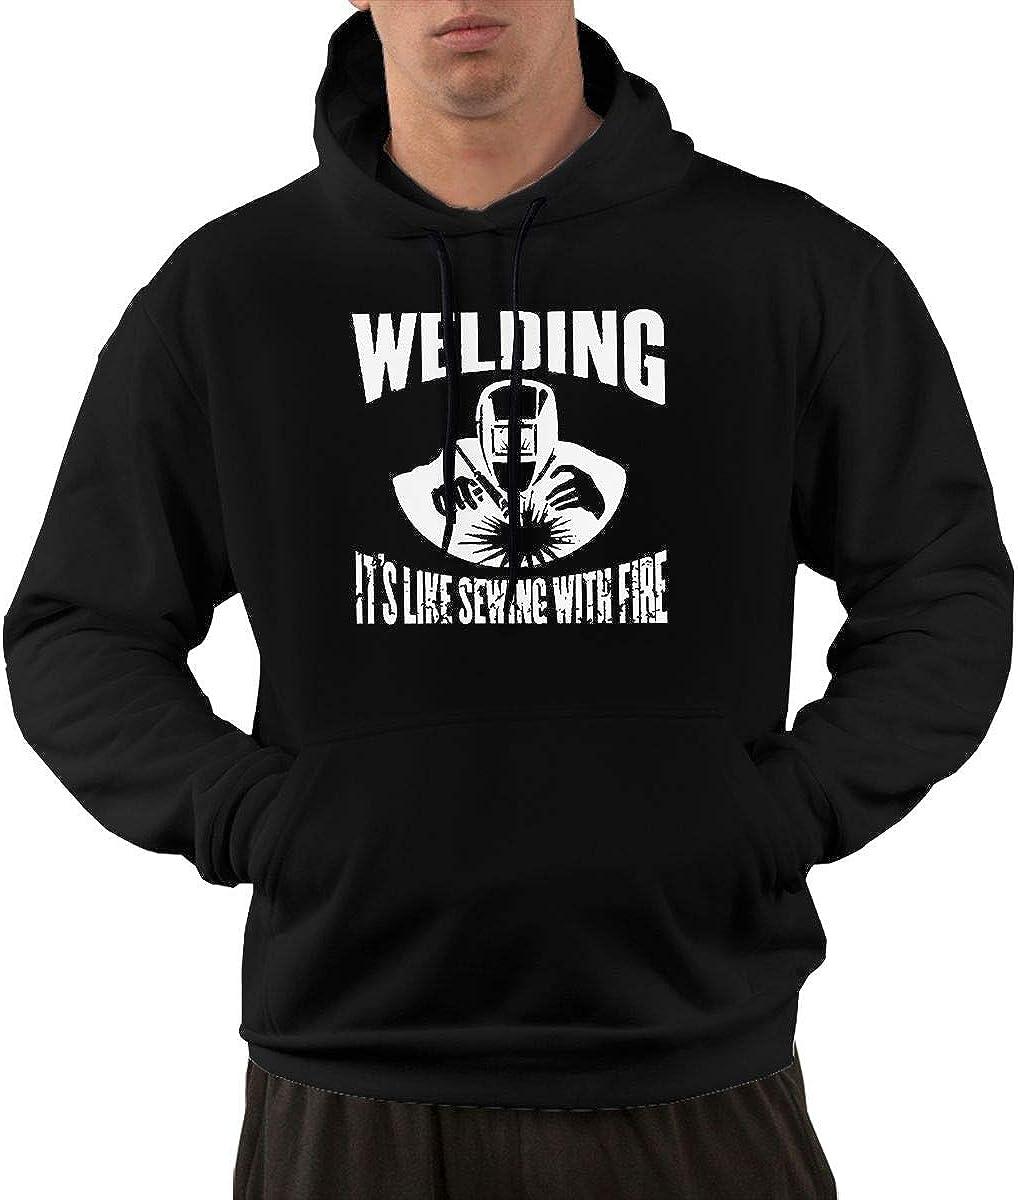 Sudadera de Manga Larga con Capucha para Hombre, diseño clásico con Texto en inglés Welding It's Like Sewing with Fire Pullover Hooded Sweatshirt with Pockets